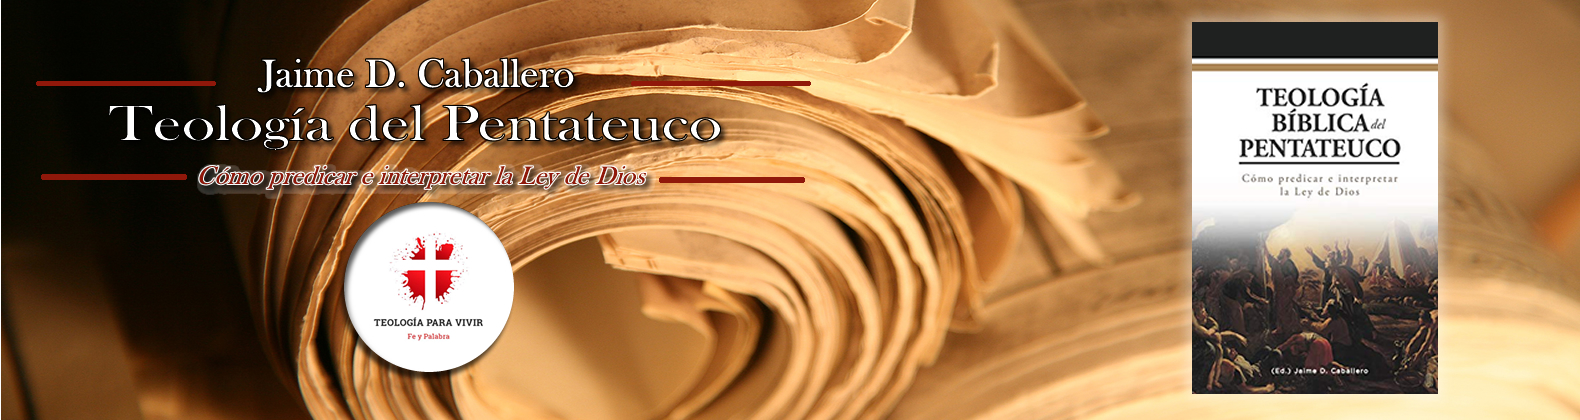 slide-teologia-del-pentateuco